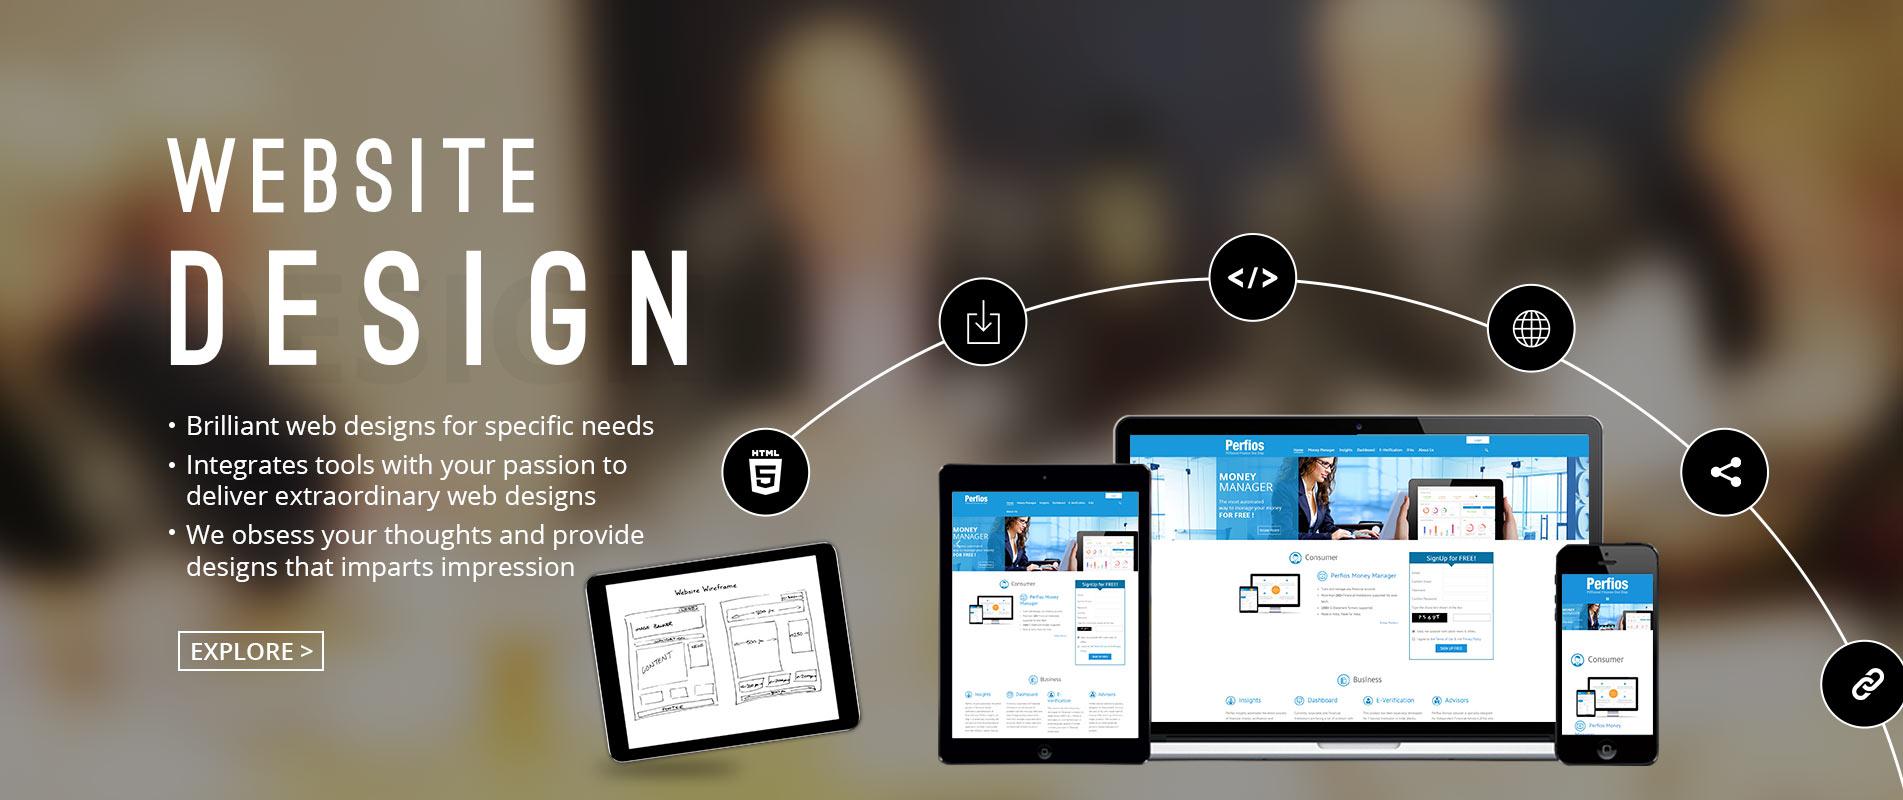 Website Design Development Bangalore